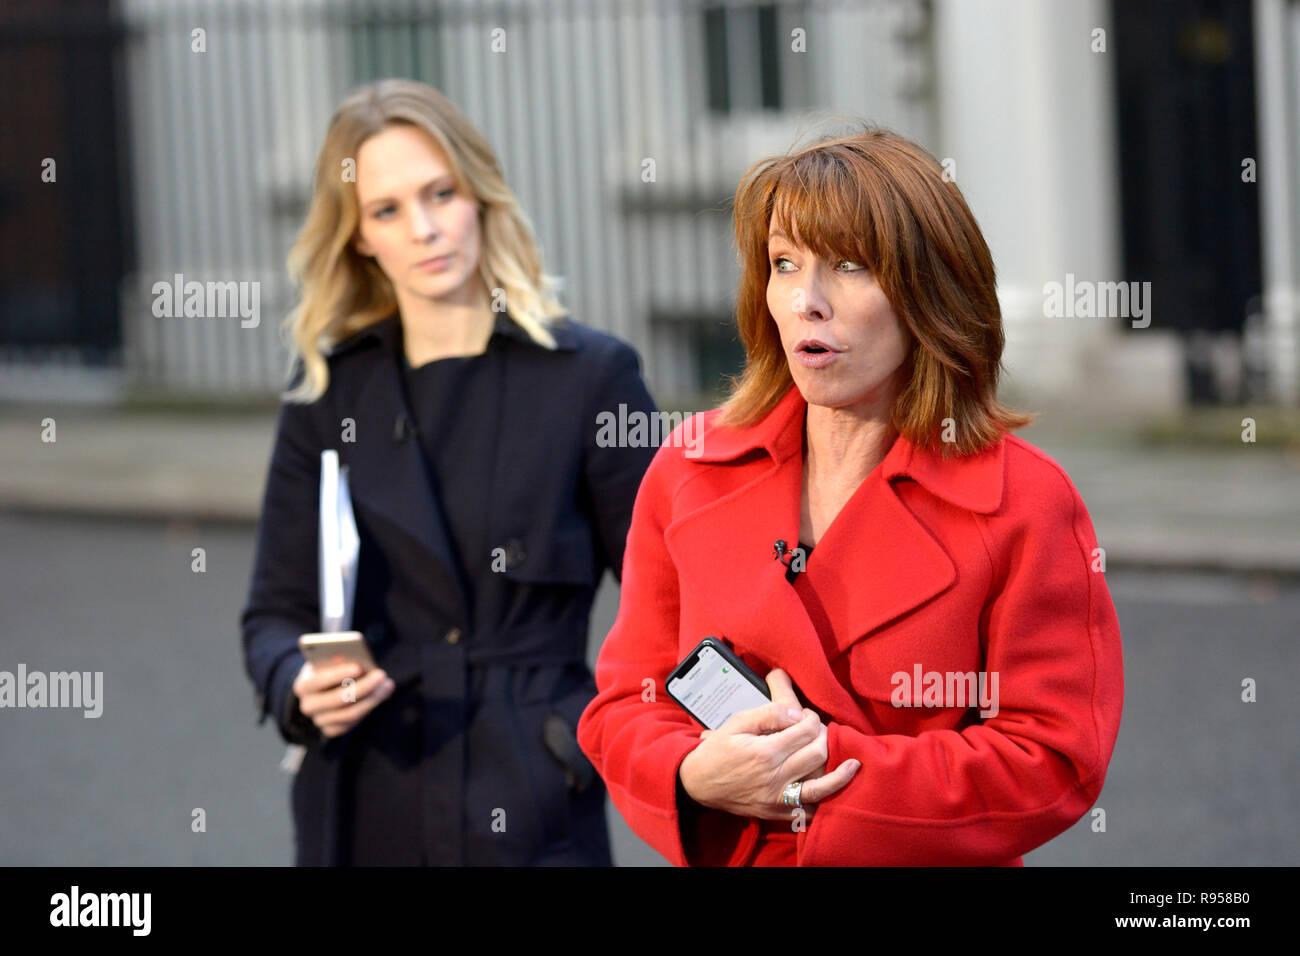 Kate Mccann News: Kay Burley Stock Photos & Kay Burley Stock Images